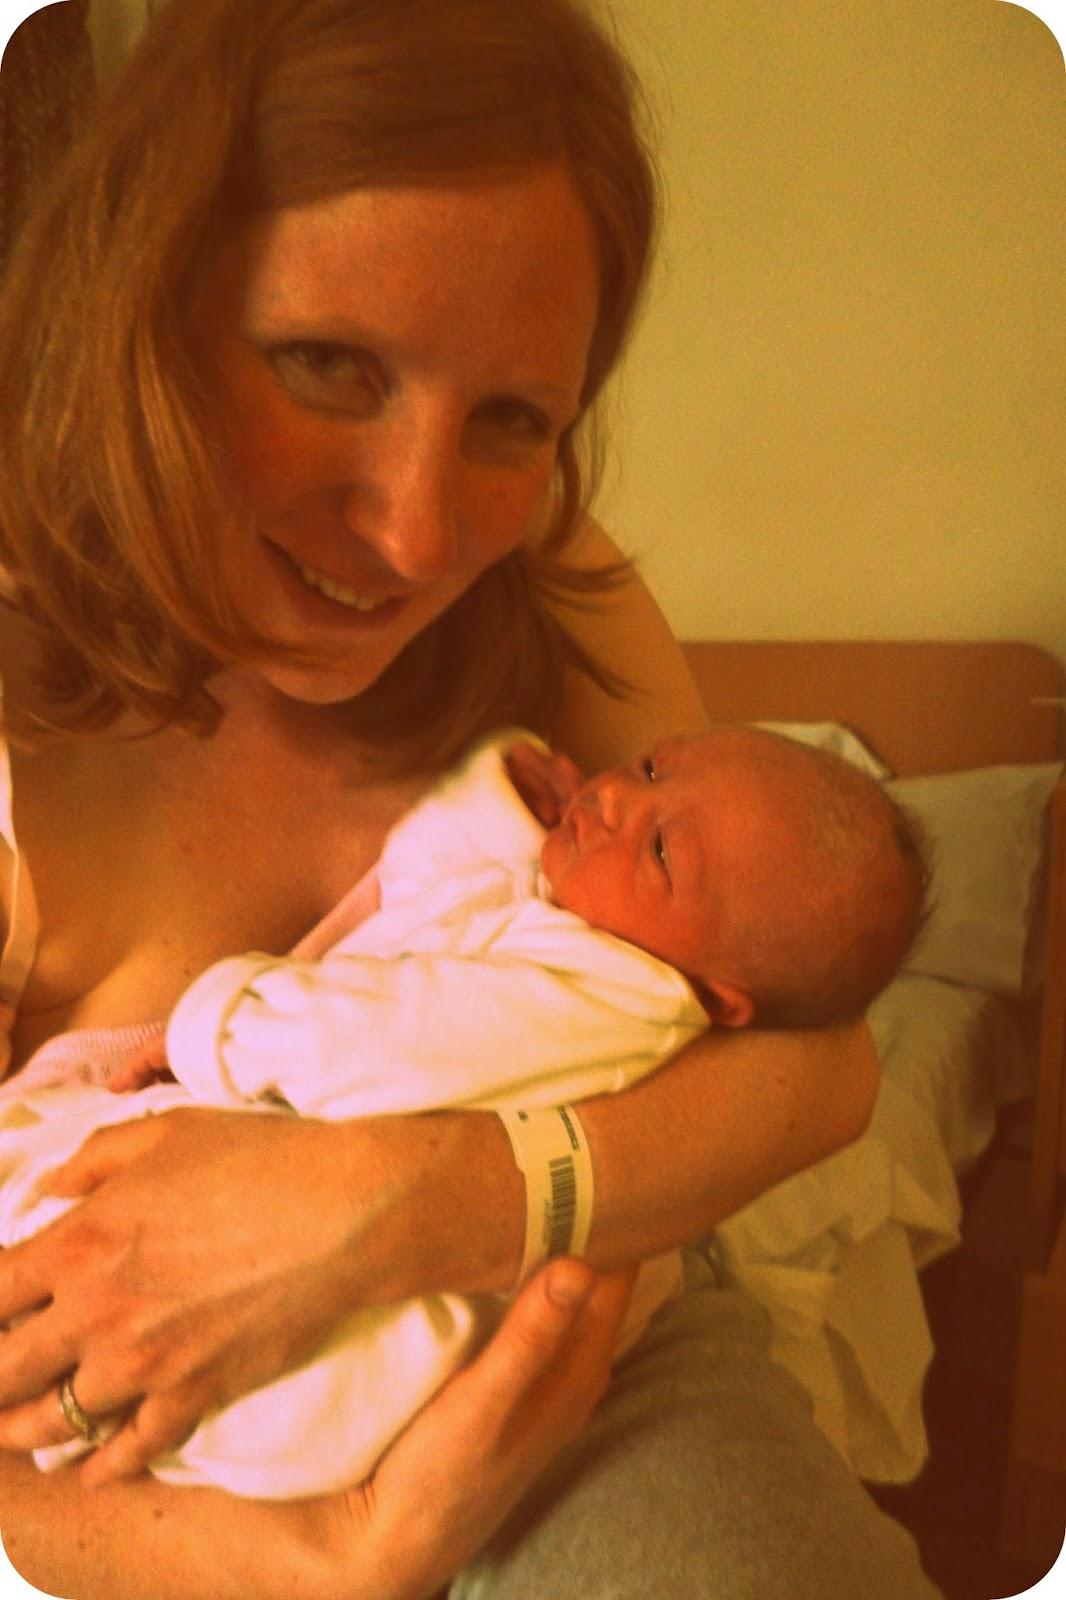 Introducing BIRTH WEEK...